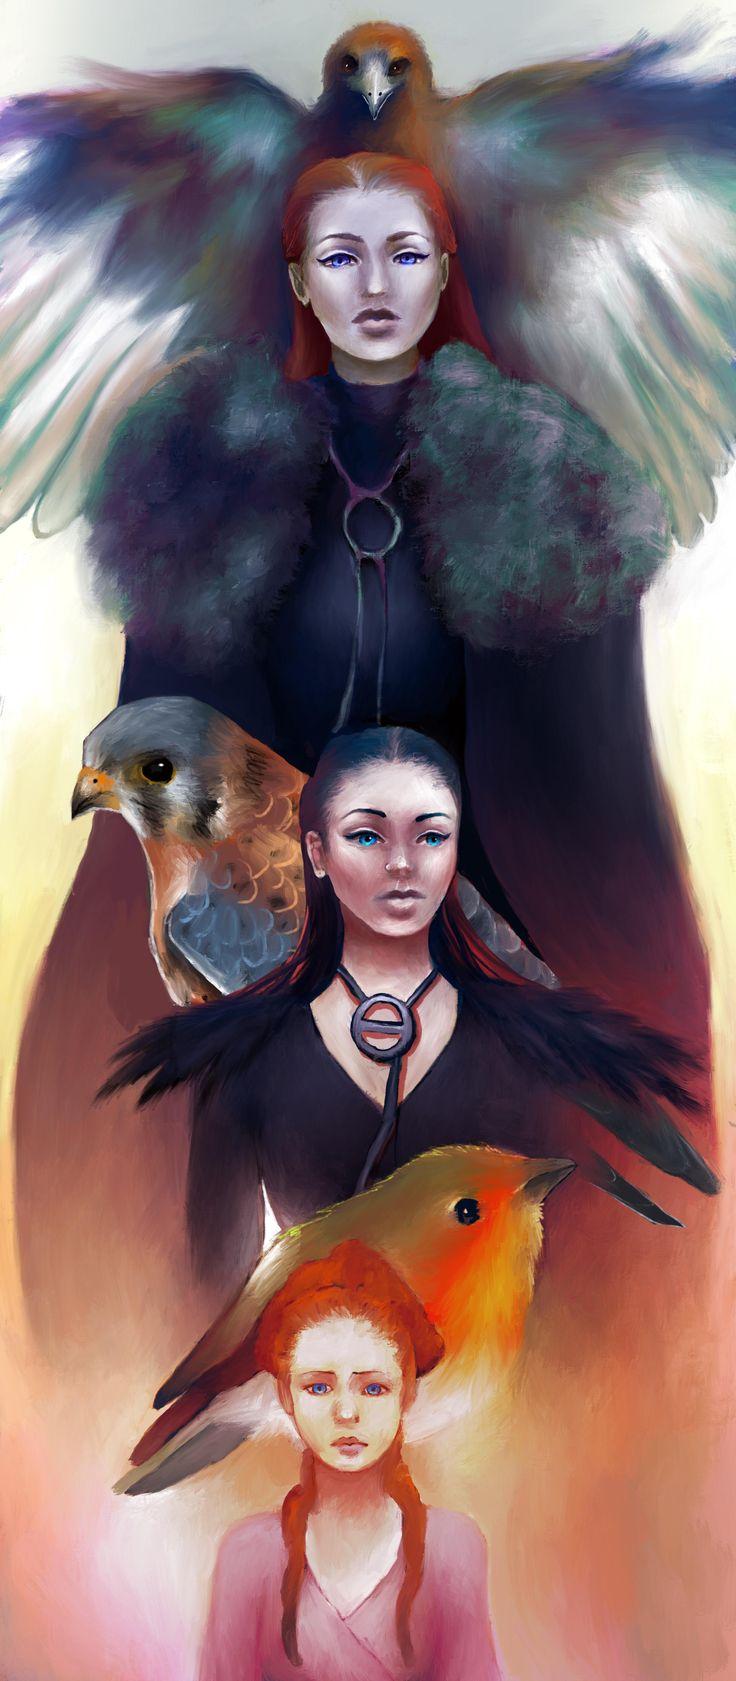 [NO SPOILERS] My Sansa fan art Music IndieArtist